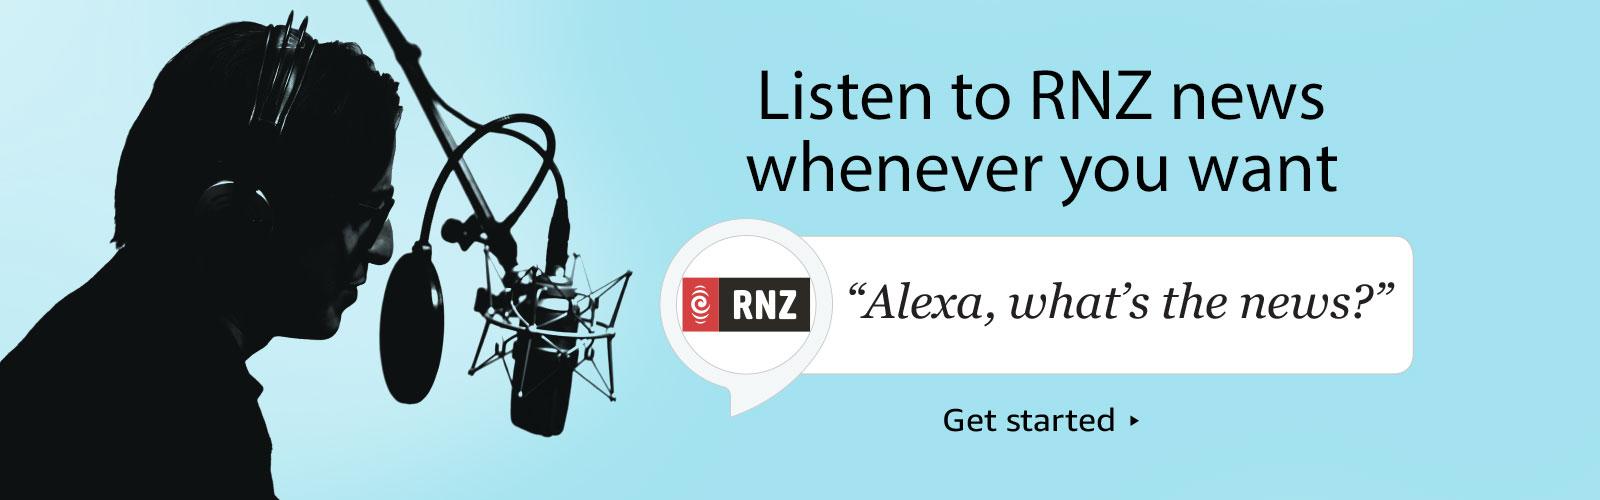 Photography and Graphic Design for RNZ's Alexa Skill - Amazon.com.au